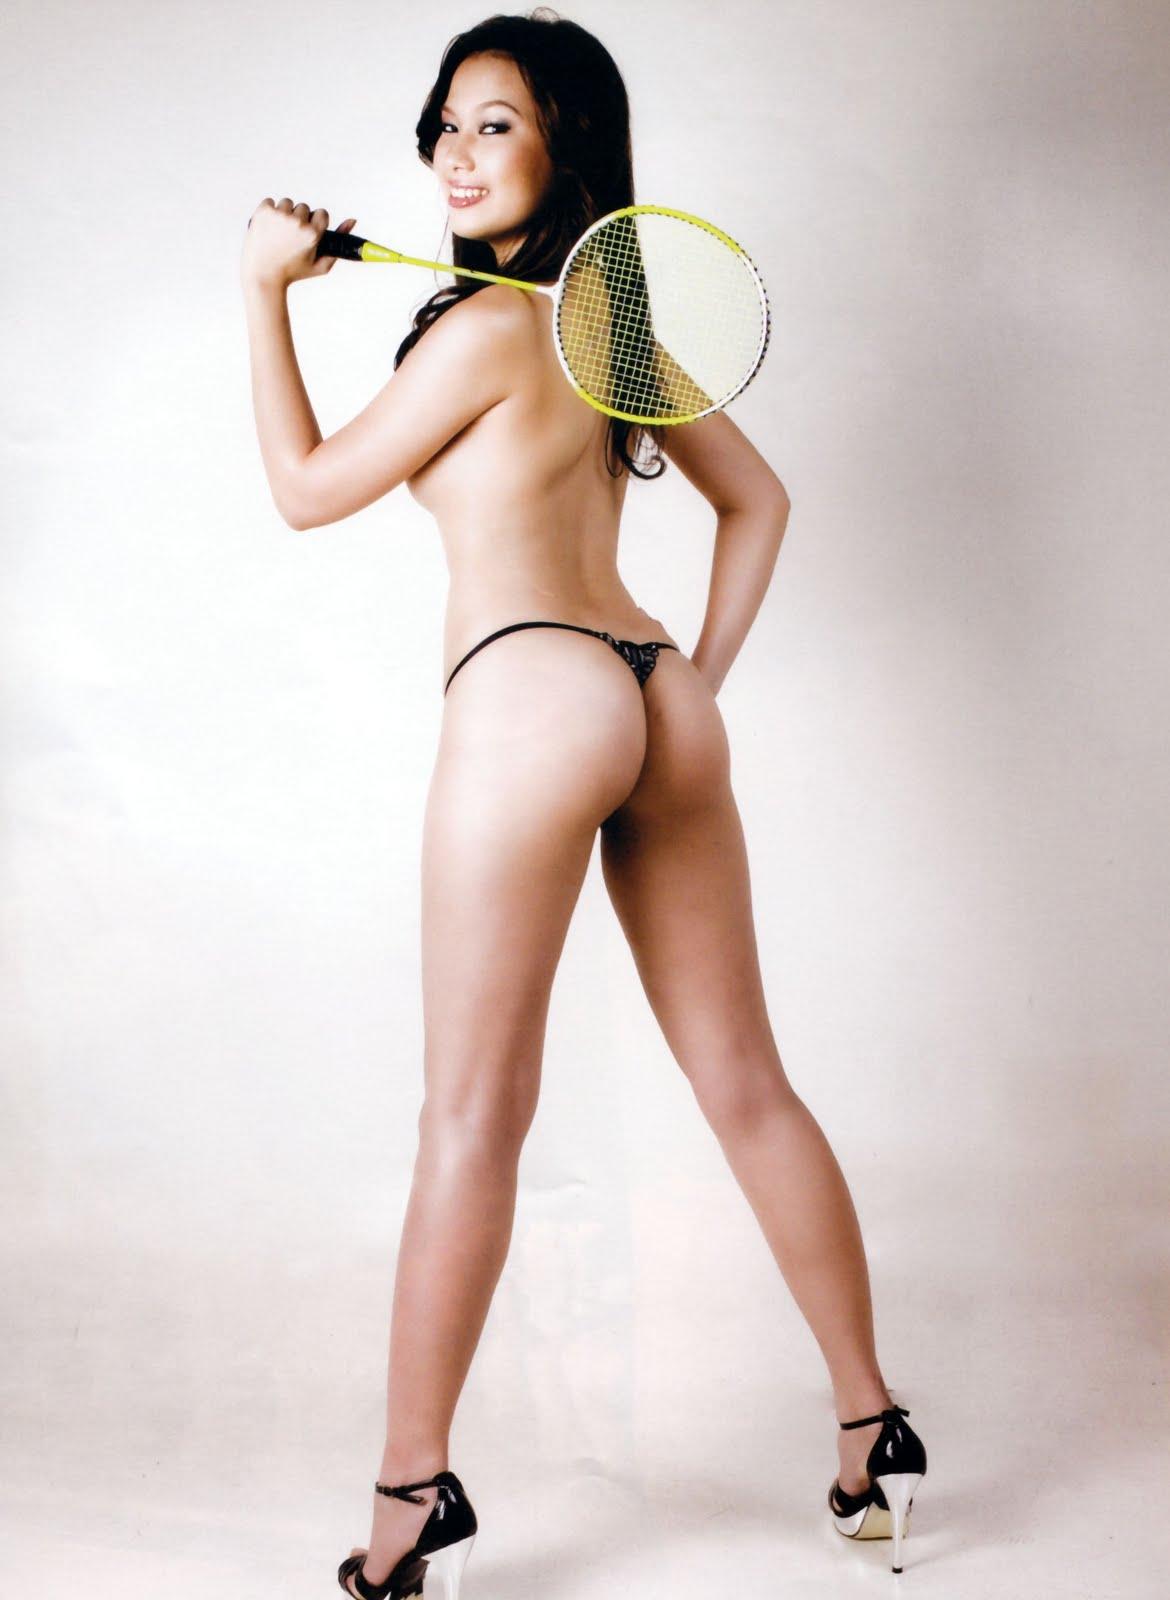 Bernice liu en bikini